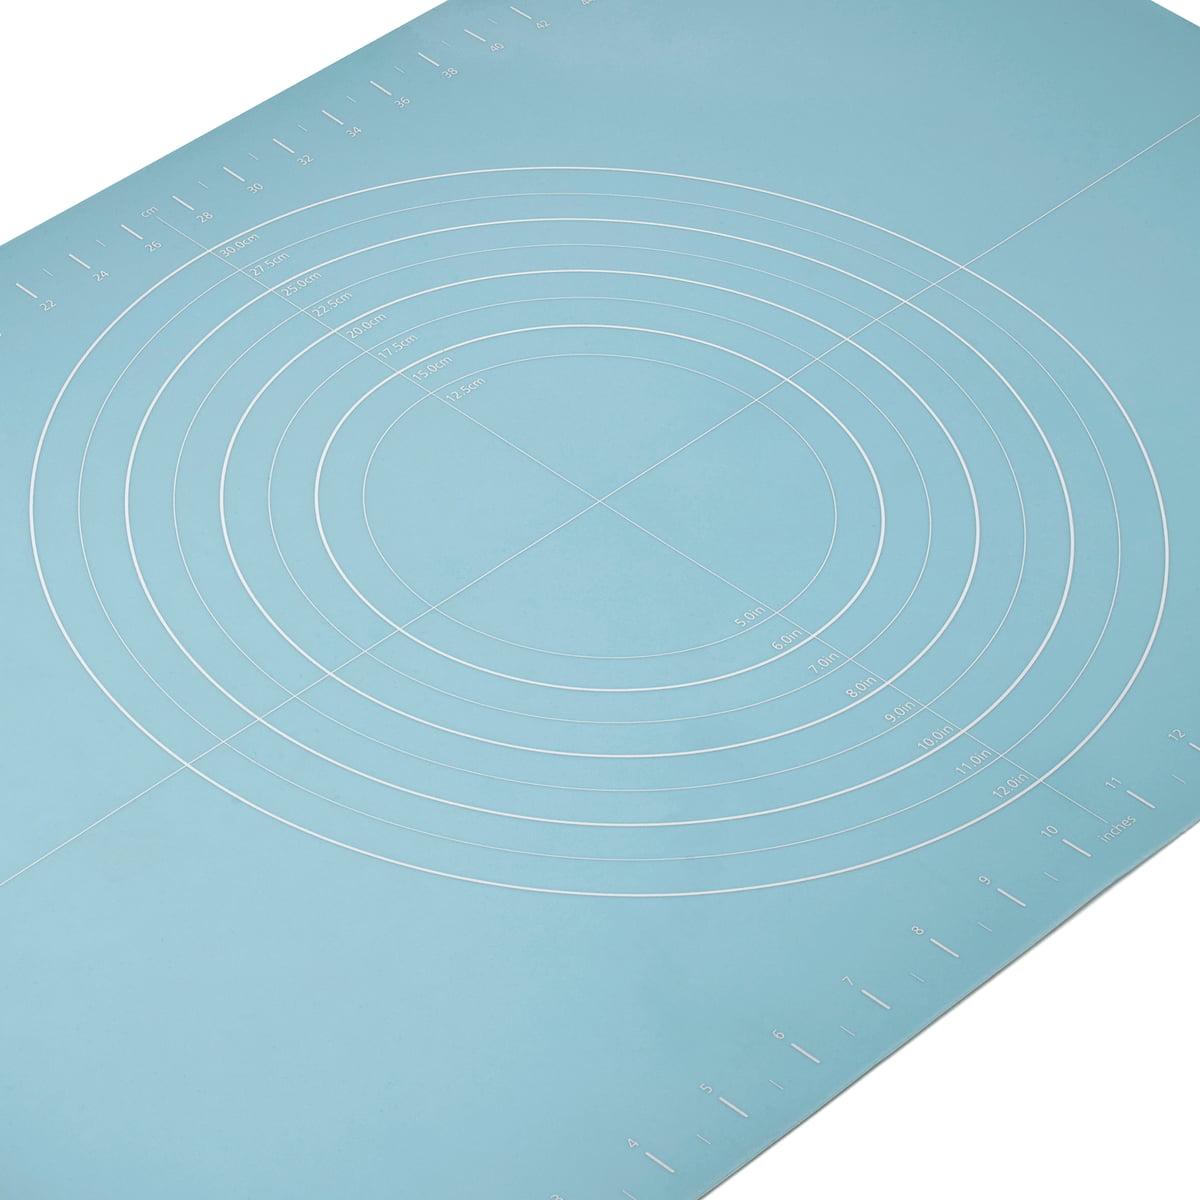 Roll-up pastry mat by Joseph Joseph